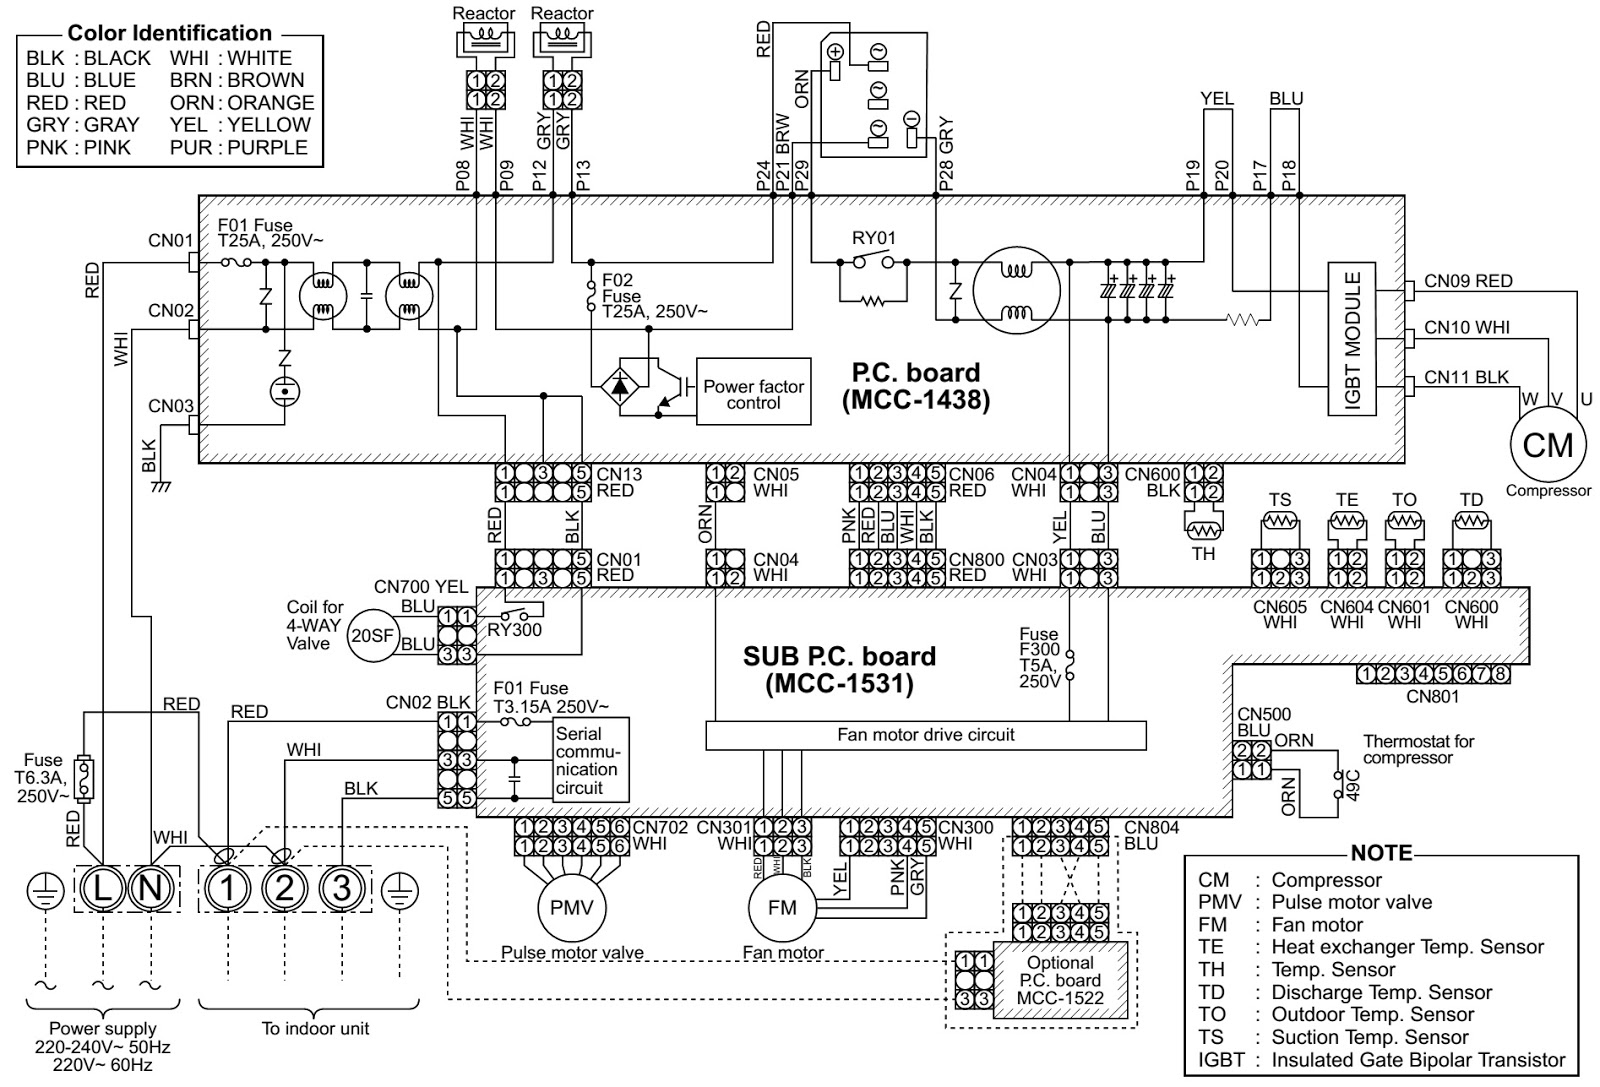 toshiba airconditioners split type wiring diagram digital toshiba air conditioning wiring diagram toshiba air conditioner installation manual [ 1600 x 1087 Pixel ]